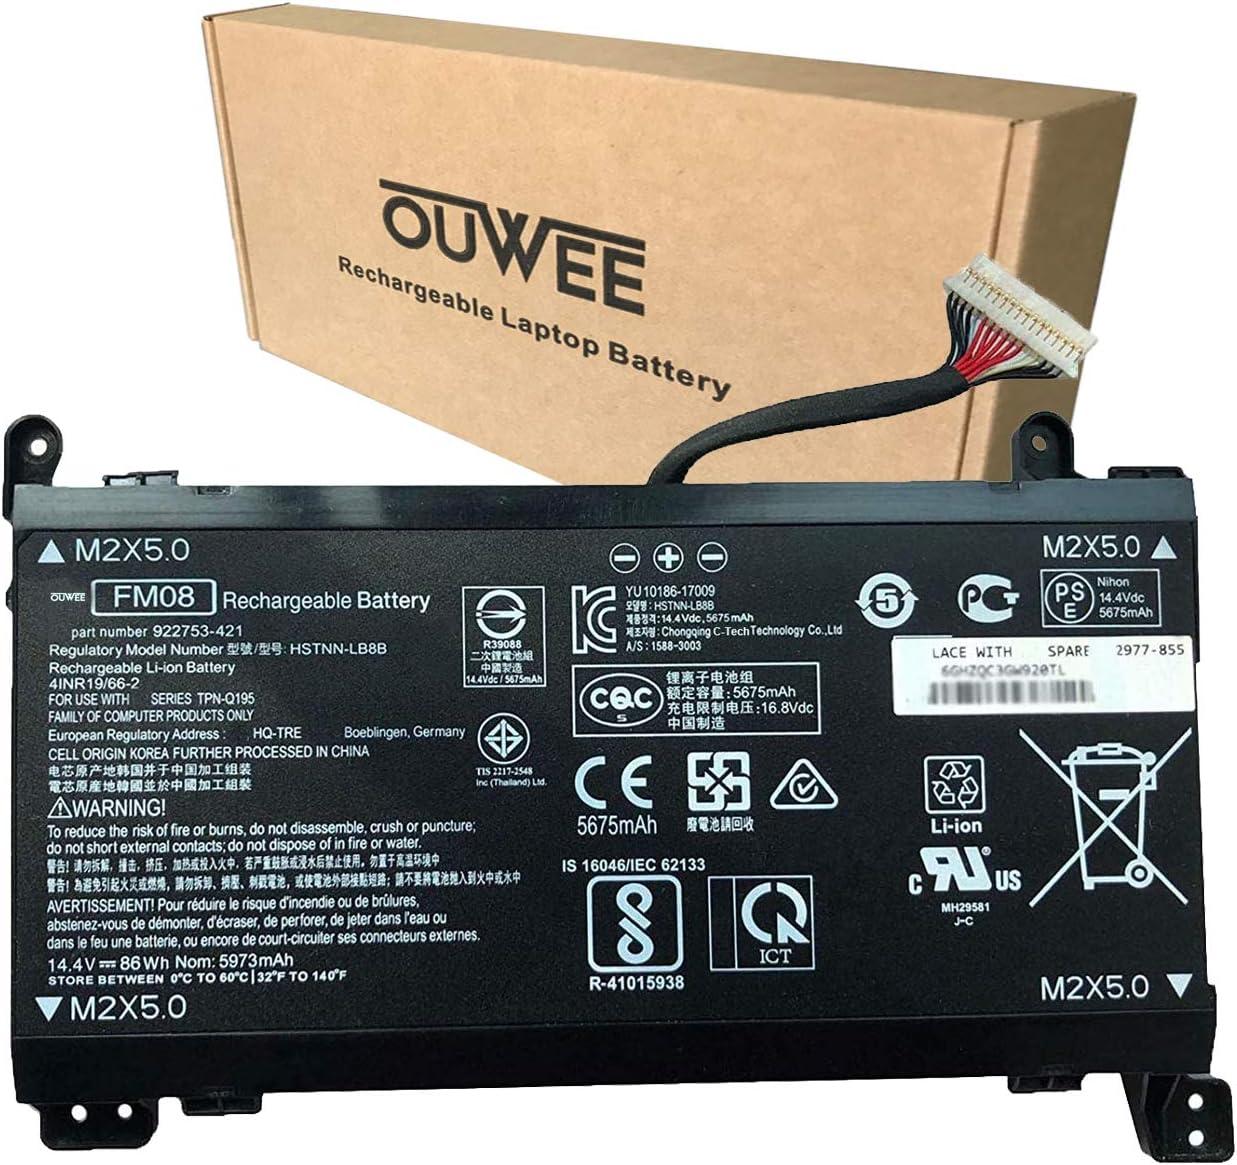 OUWEE FM08 Laptop Battery Compatible with HP Omen 17-AN013TX 17-AN014TX 17-AN014NG 17-an008ur Series Notebook TPN-Q195 922752-421 922753-421 922976-855 HSTNN-LB8B 14.4V 86Wh 5973mAh(16-Pin Connector)